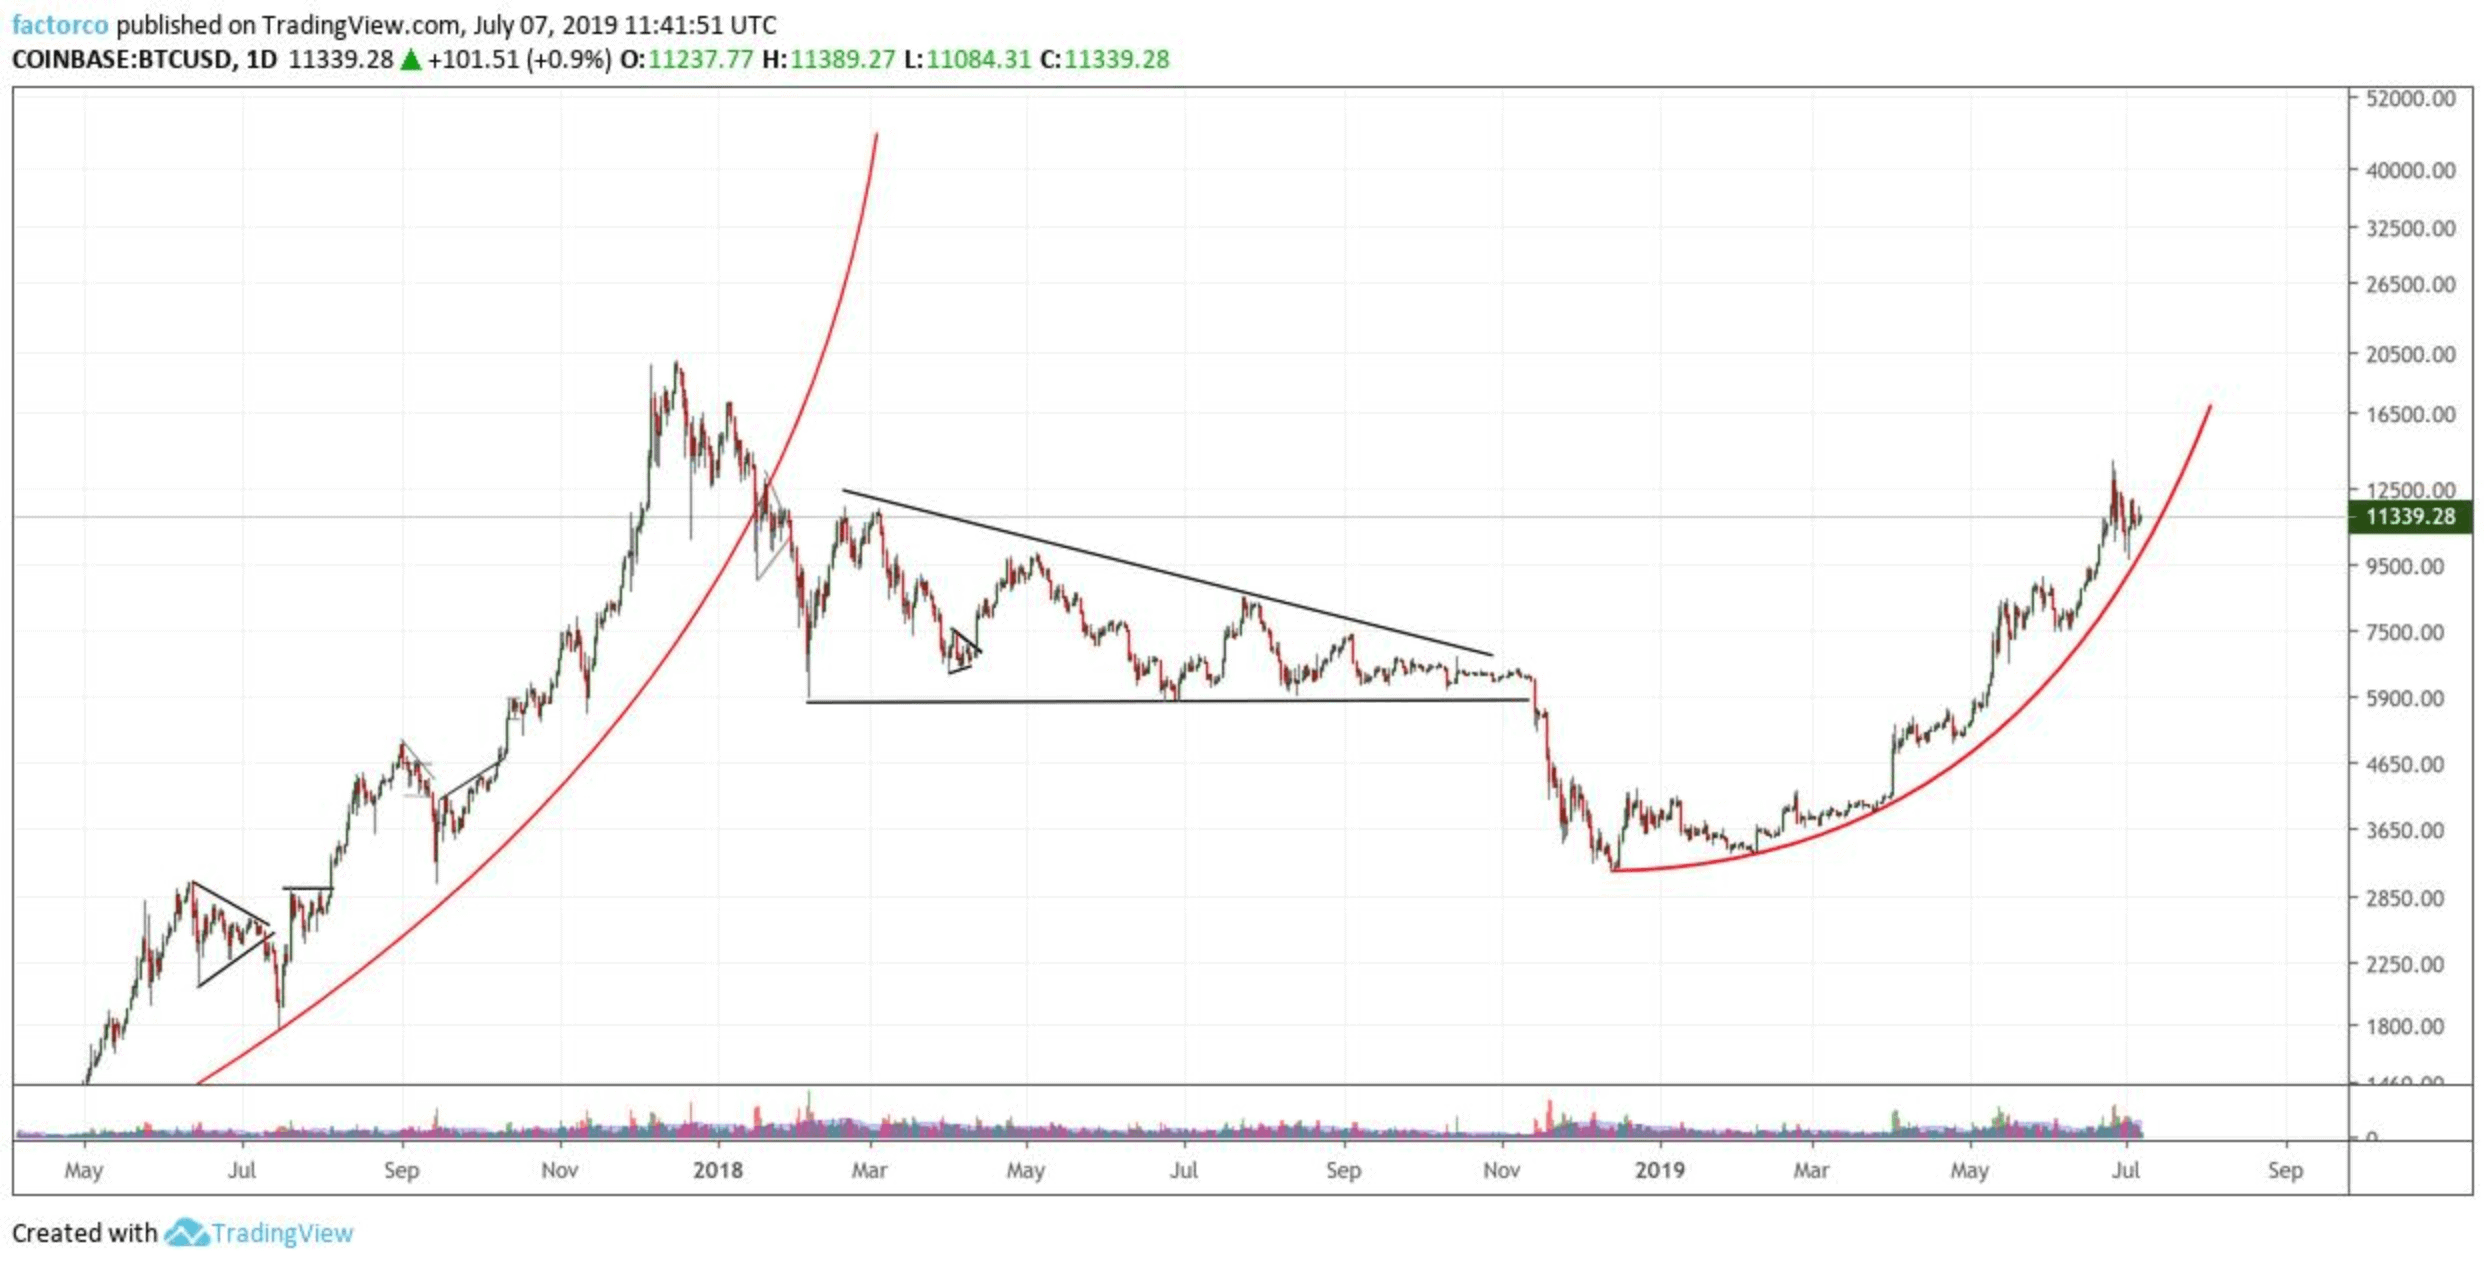 btc price parabola